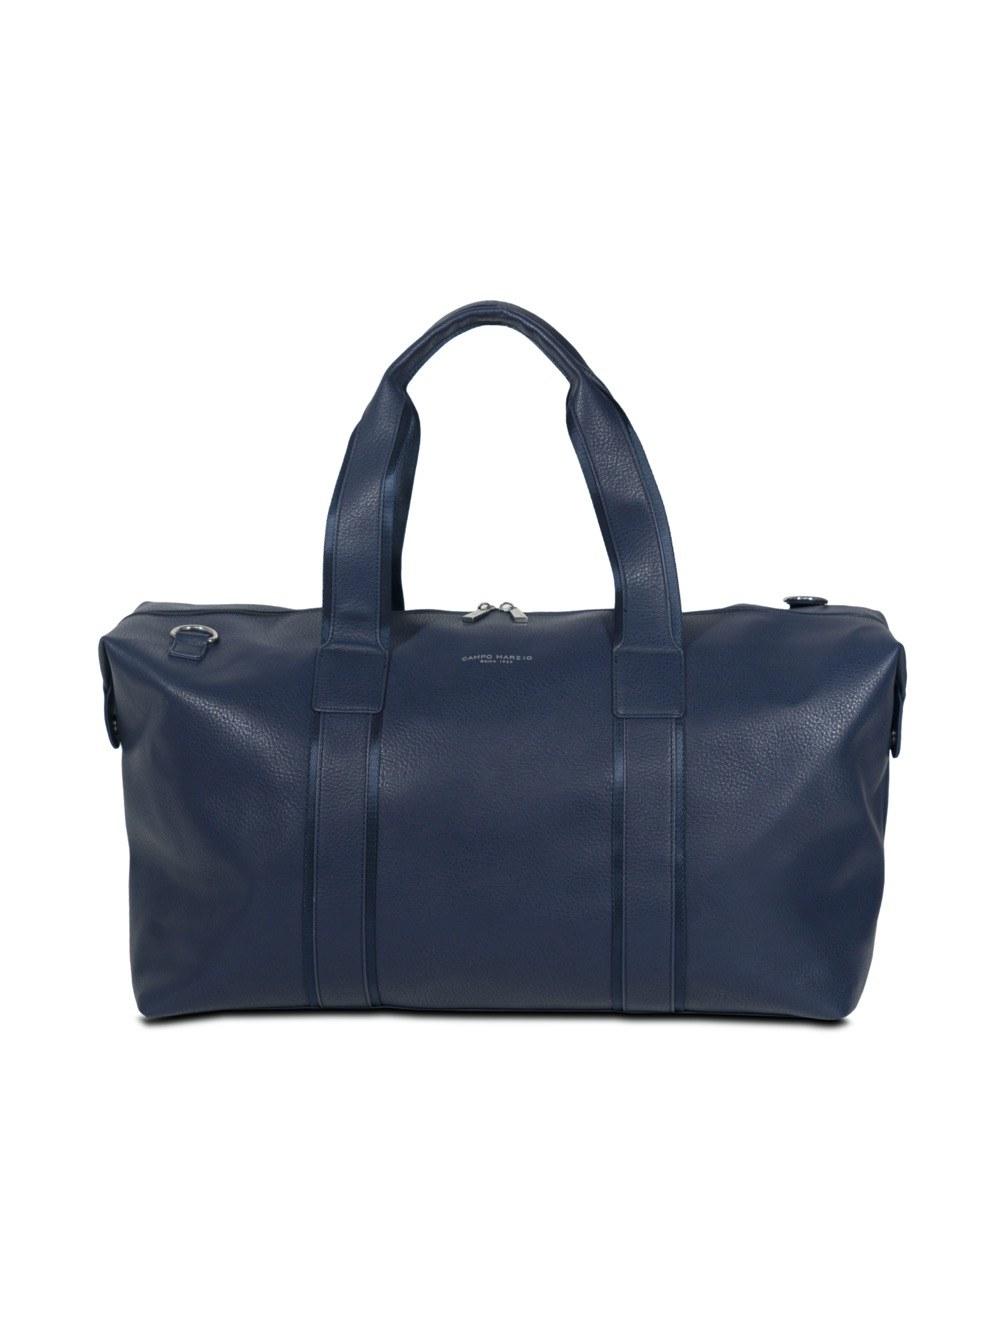 Roald Travel Bag - Blue